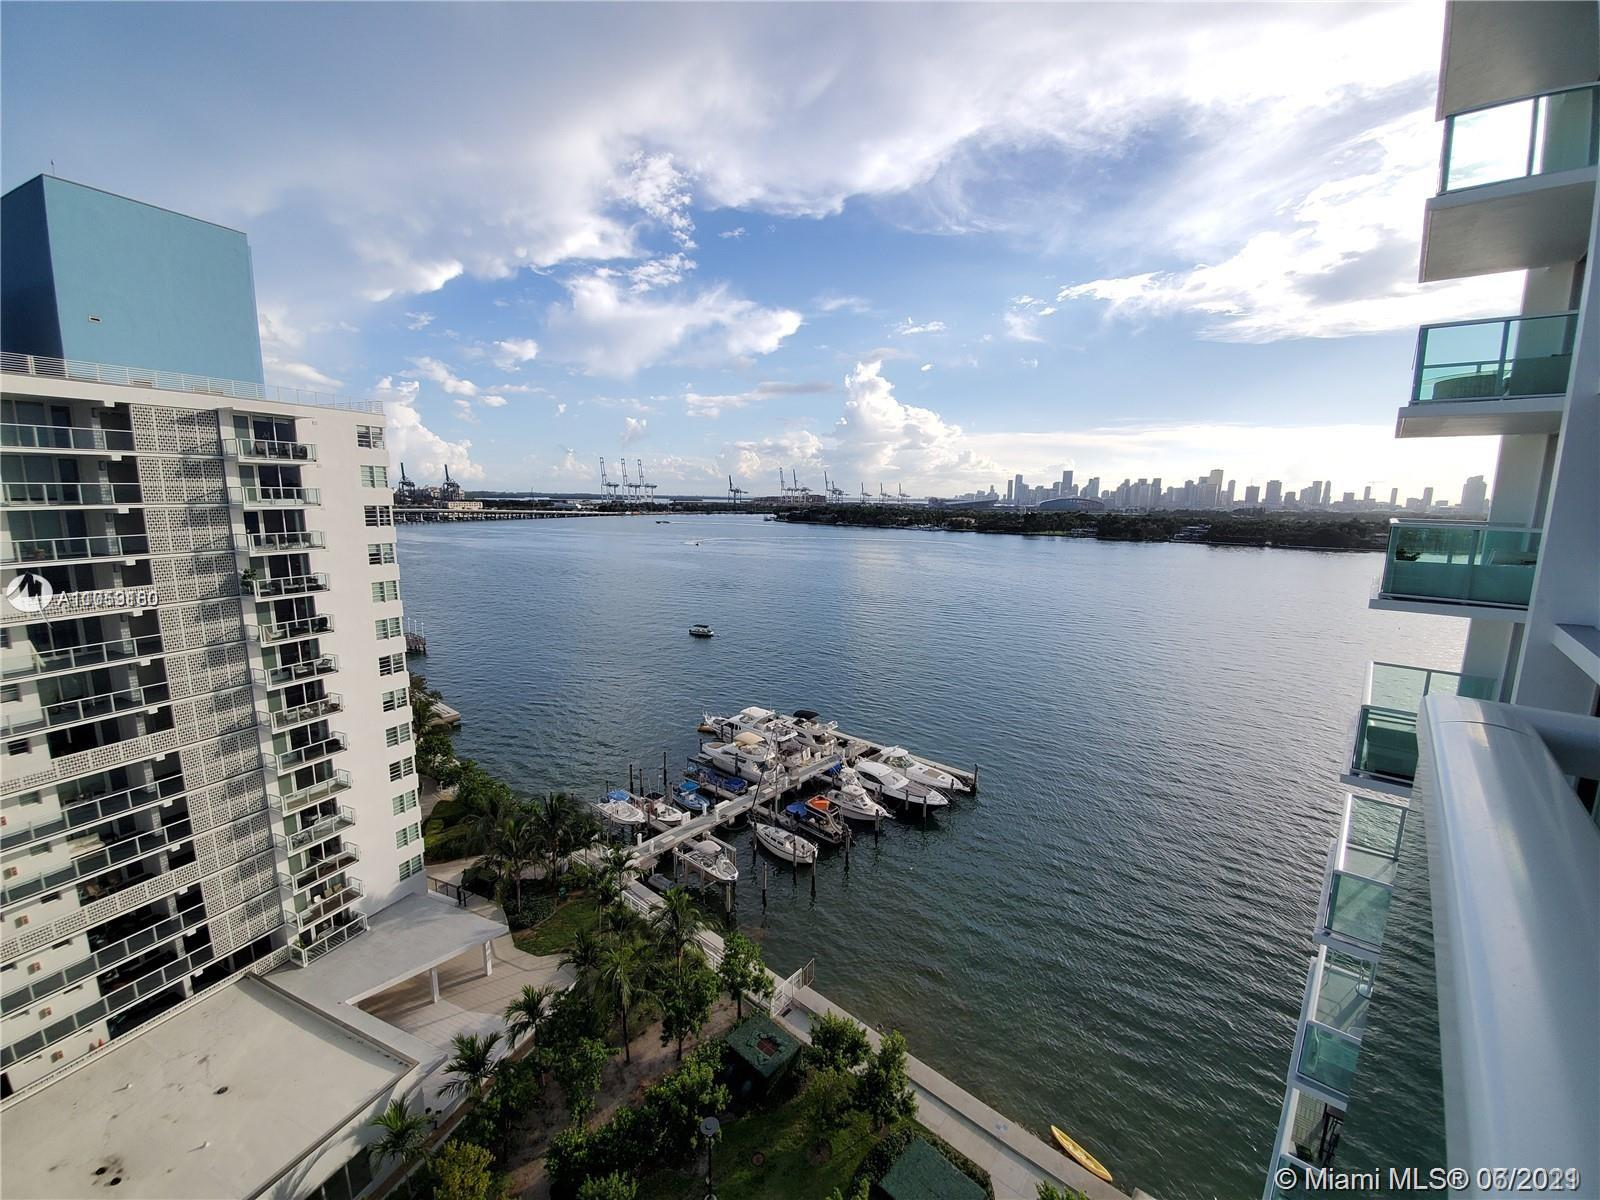 Mirador South #1226 - 1000 West Ave #1226, Miami Beach, FL 33139